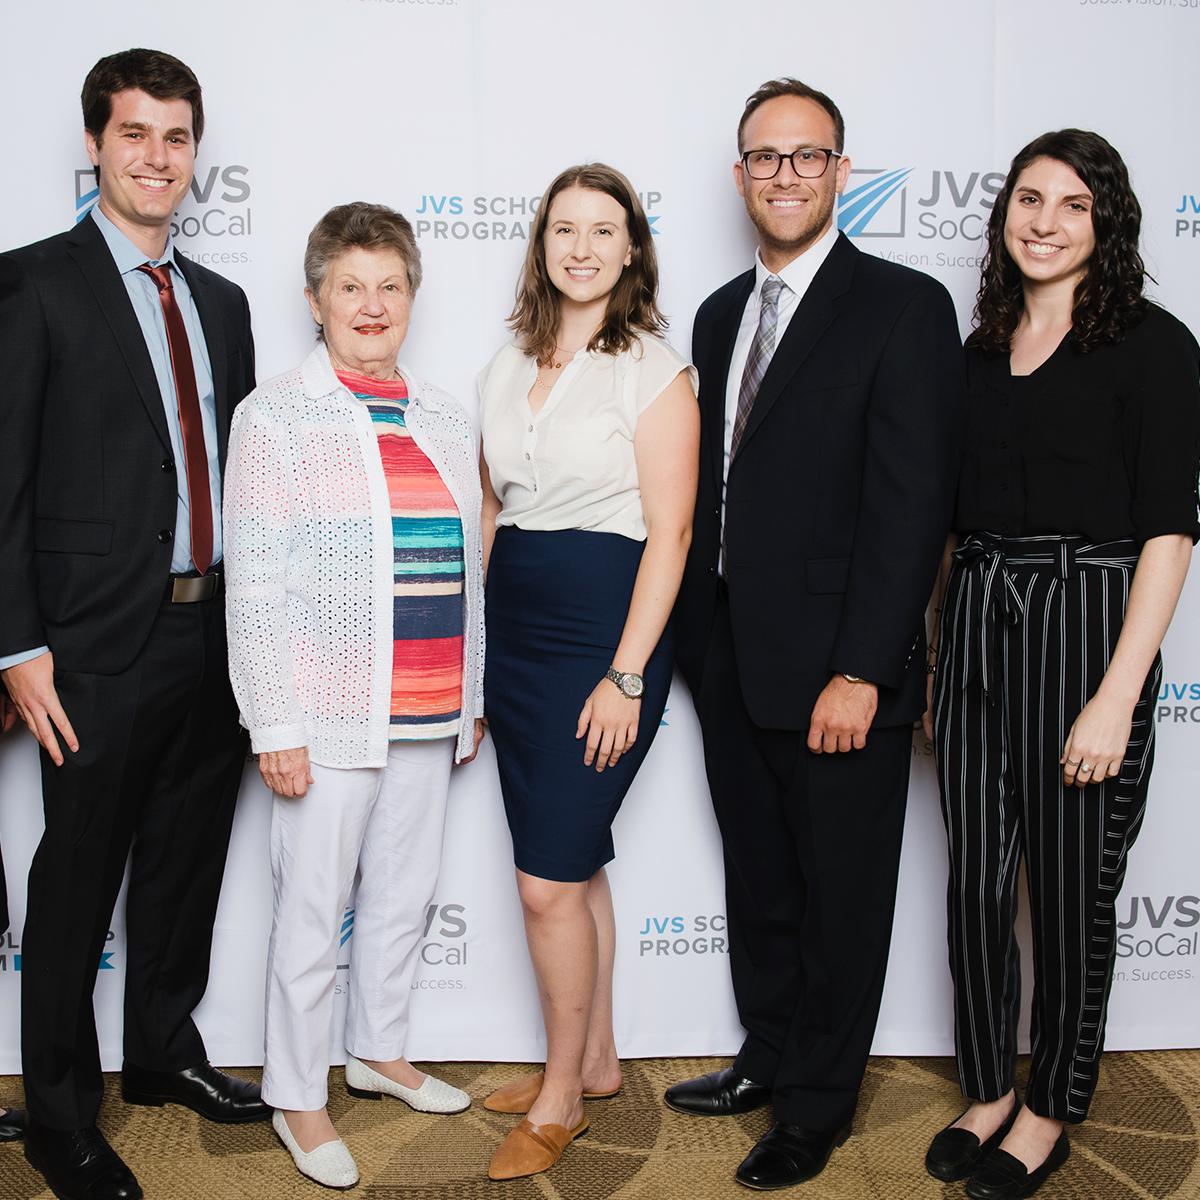 JVS-Scholarship-2019-Gallery-6